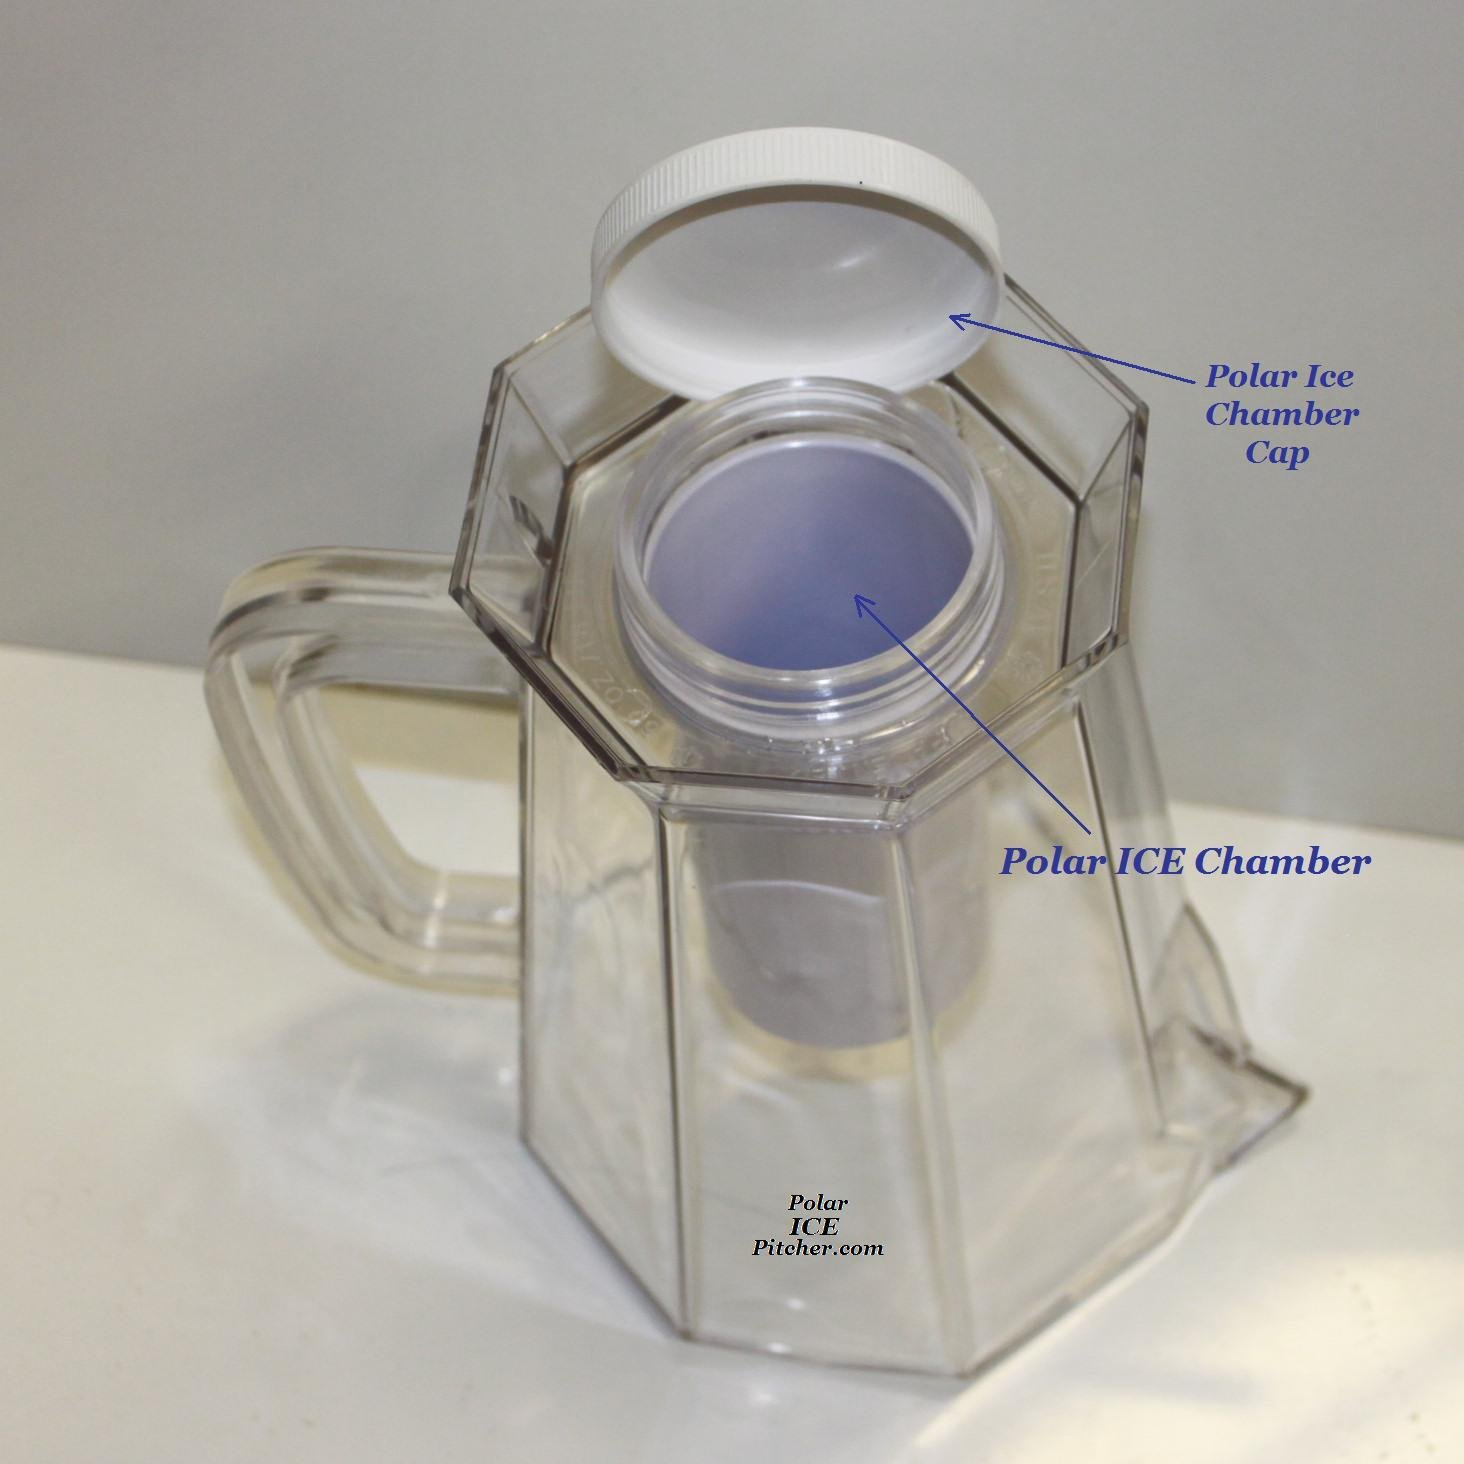 Polar ICE Pitcher with Aluminum Polar ICE Chamber Clear